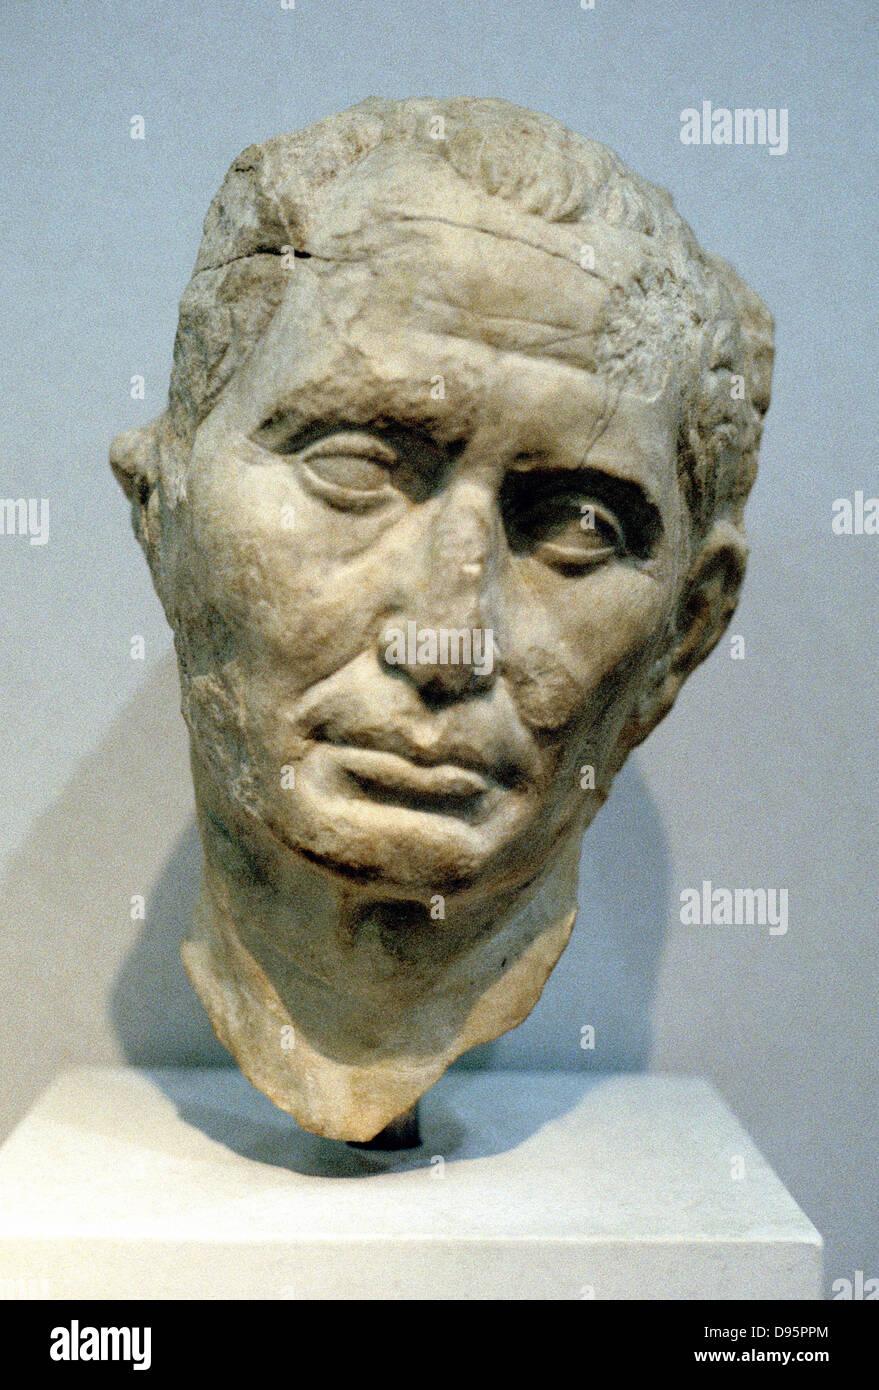 Julius Caesar (c100-44 BC) Roman soldier and statesman. Portrait bust - Stock Image